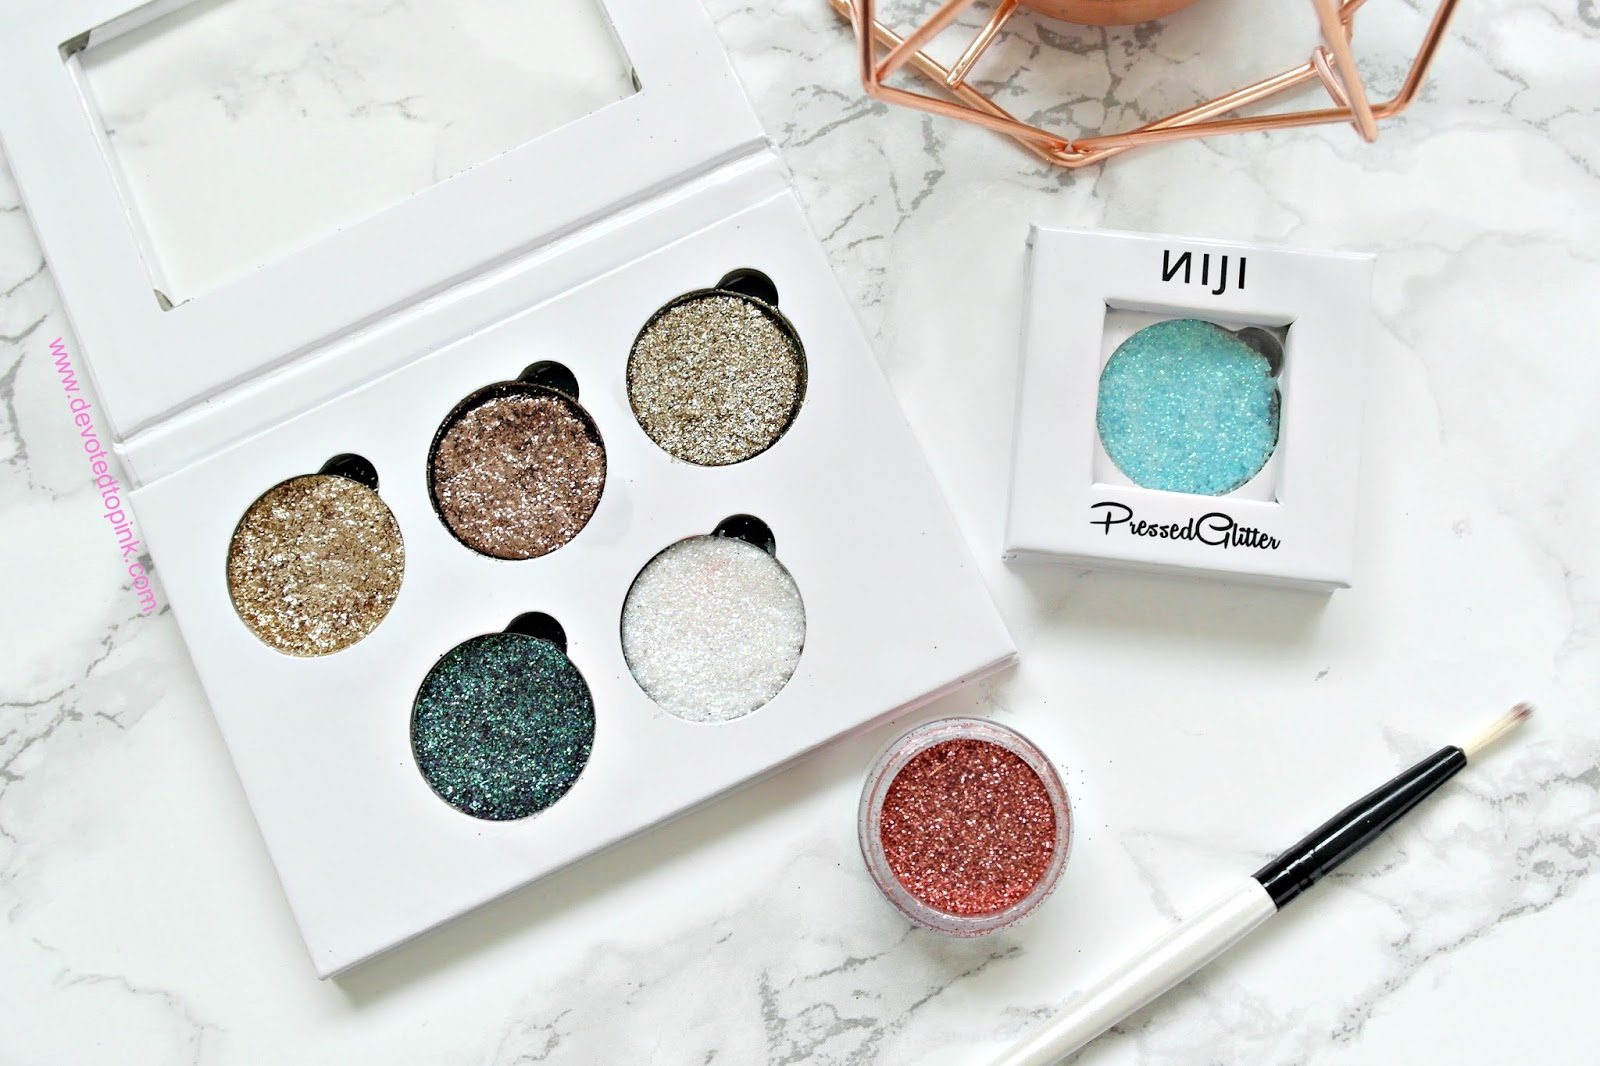 glittereyes, niji cosmetics, glitter, review, glitter lovers, glitter eyeshadow